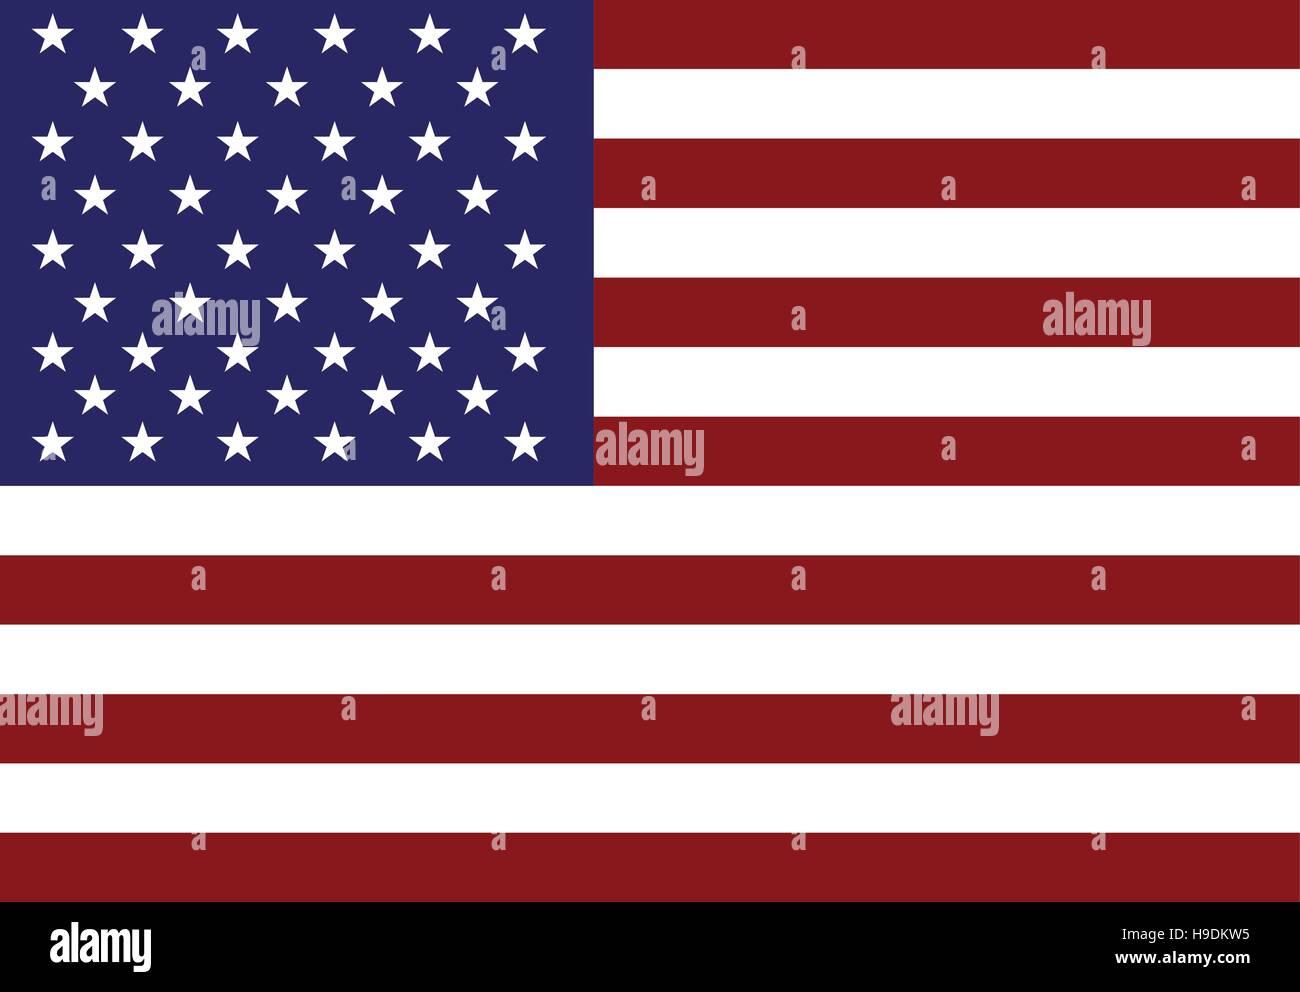 American flag icon - Stock Image